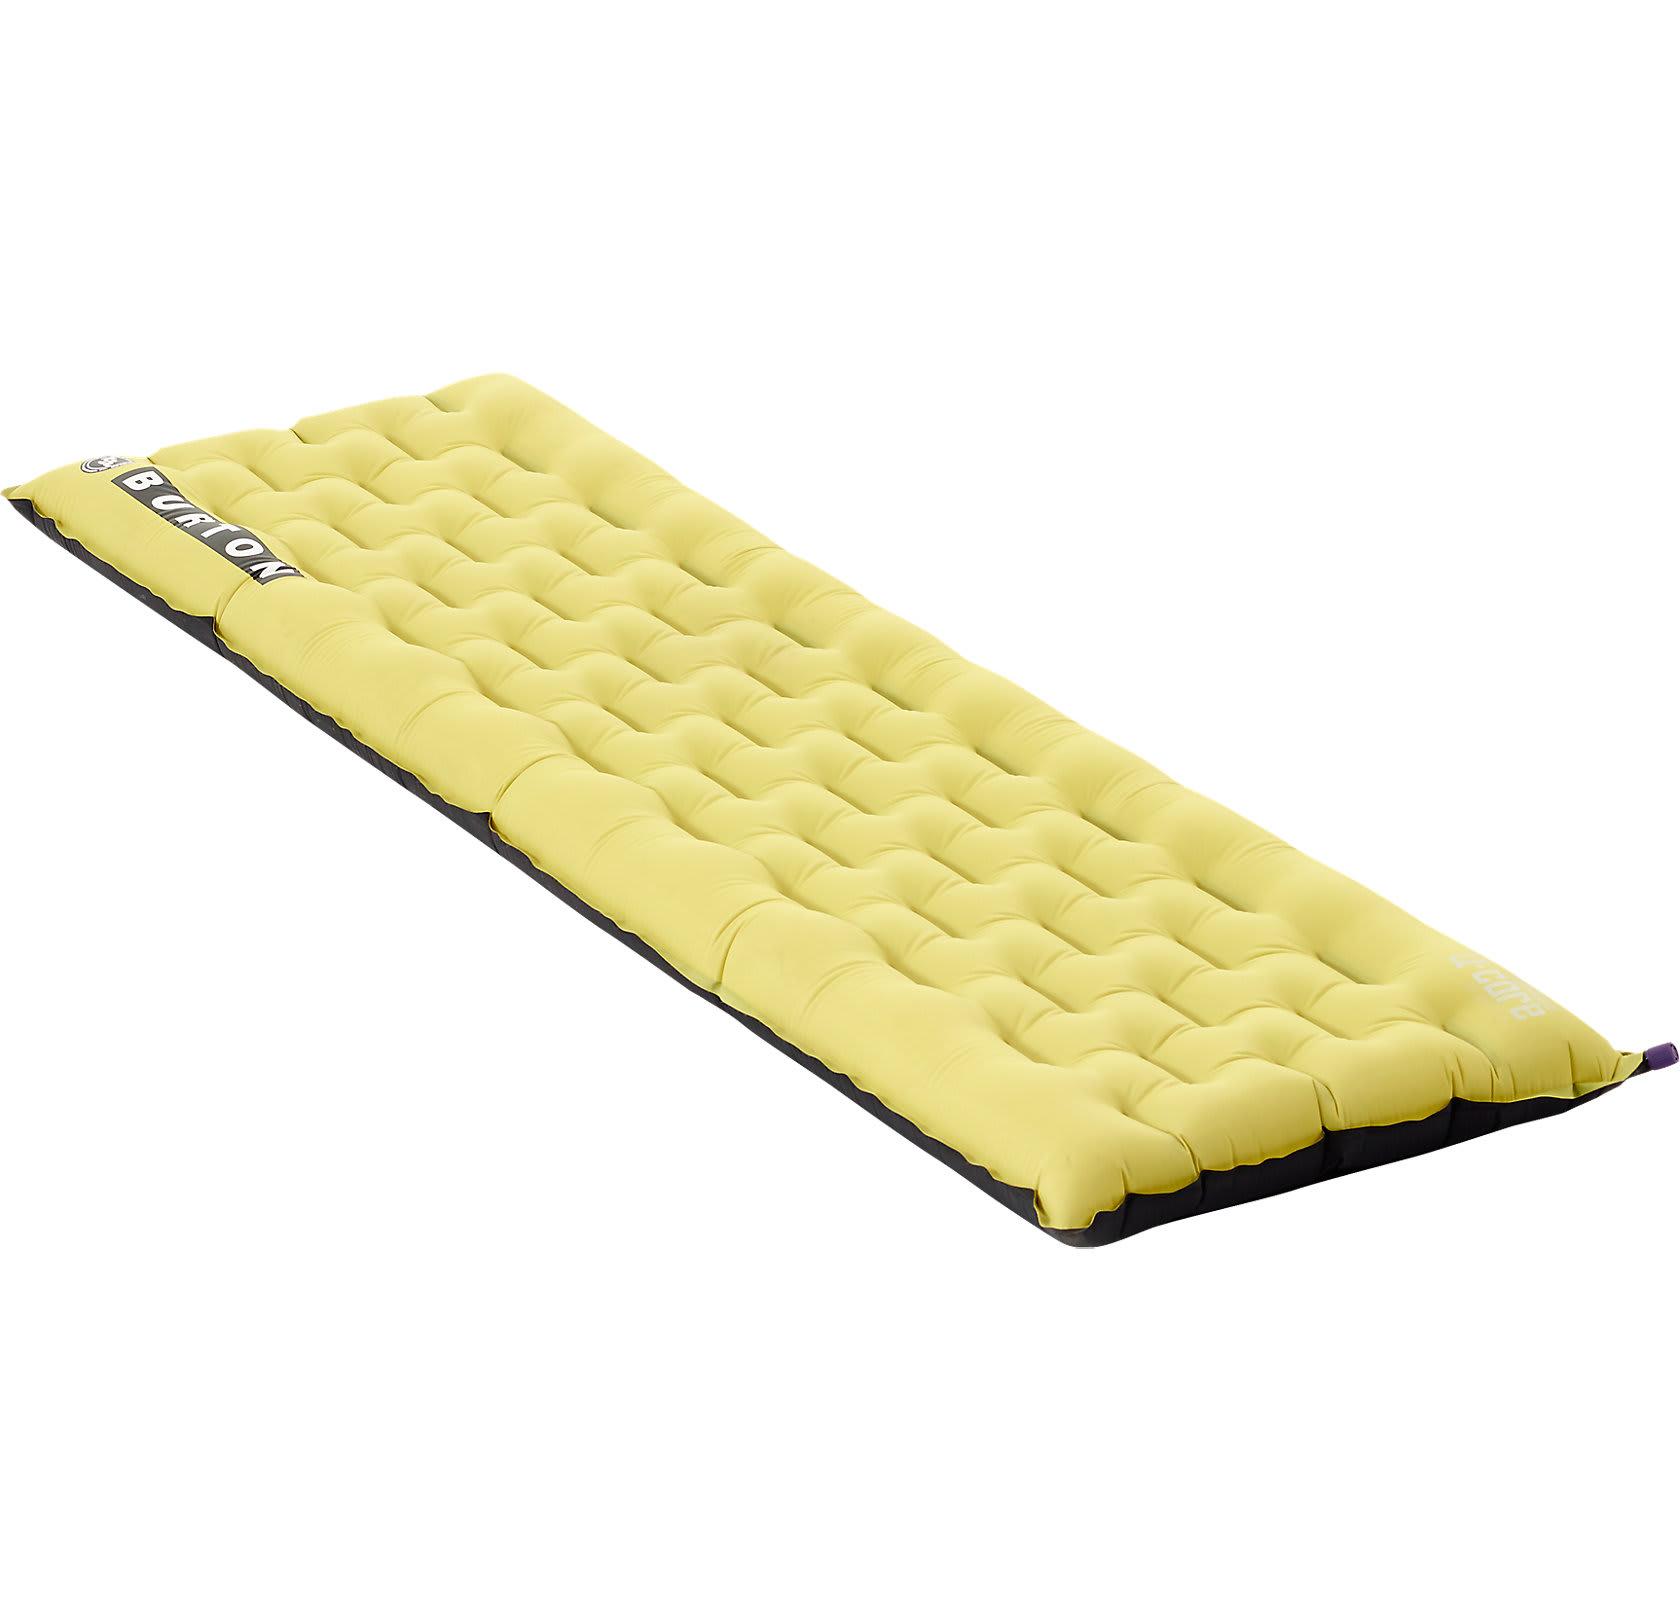 Air Beds & Sleeping Pads